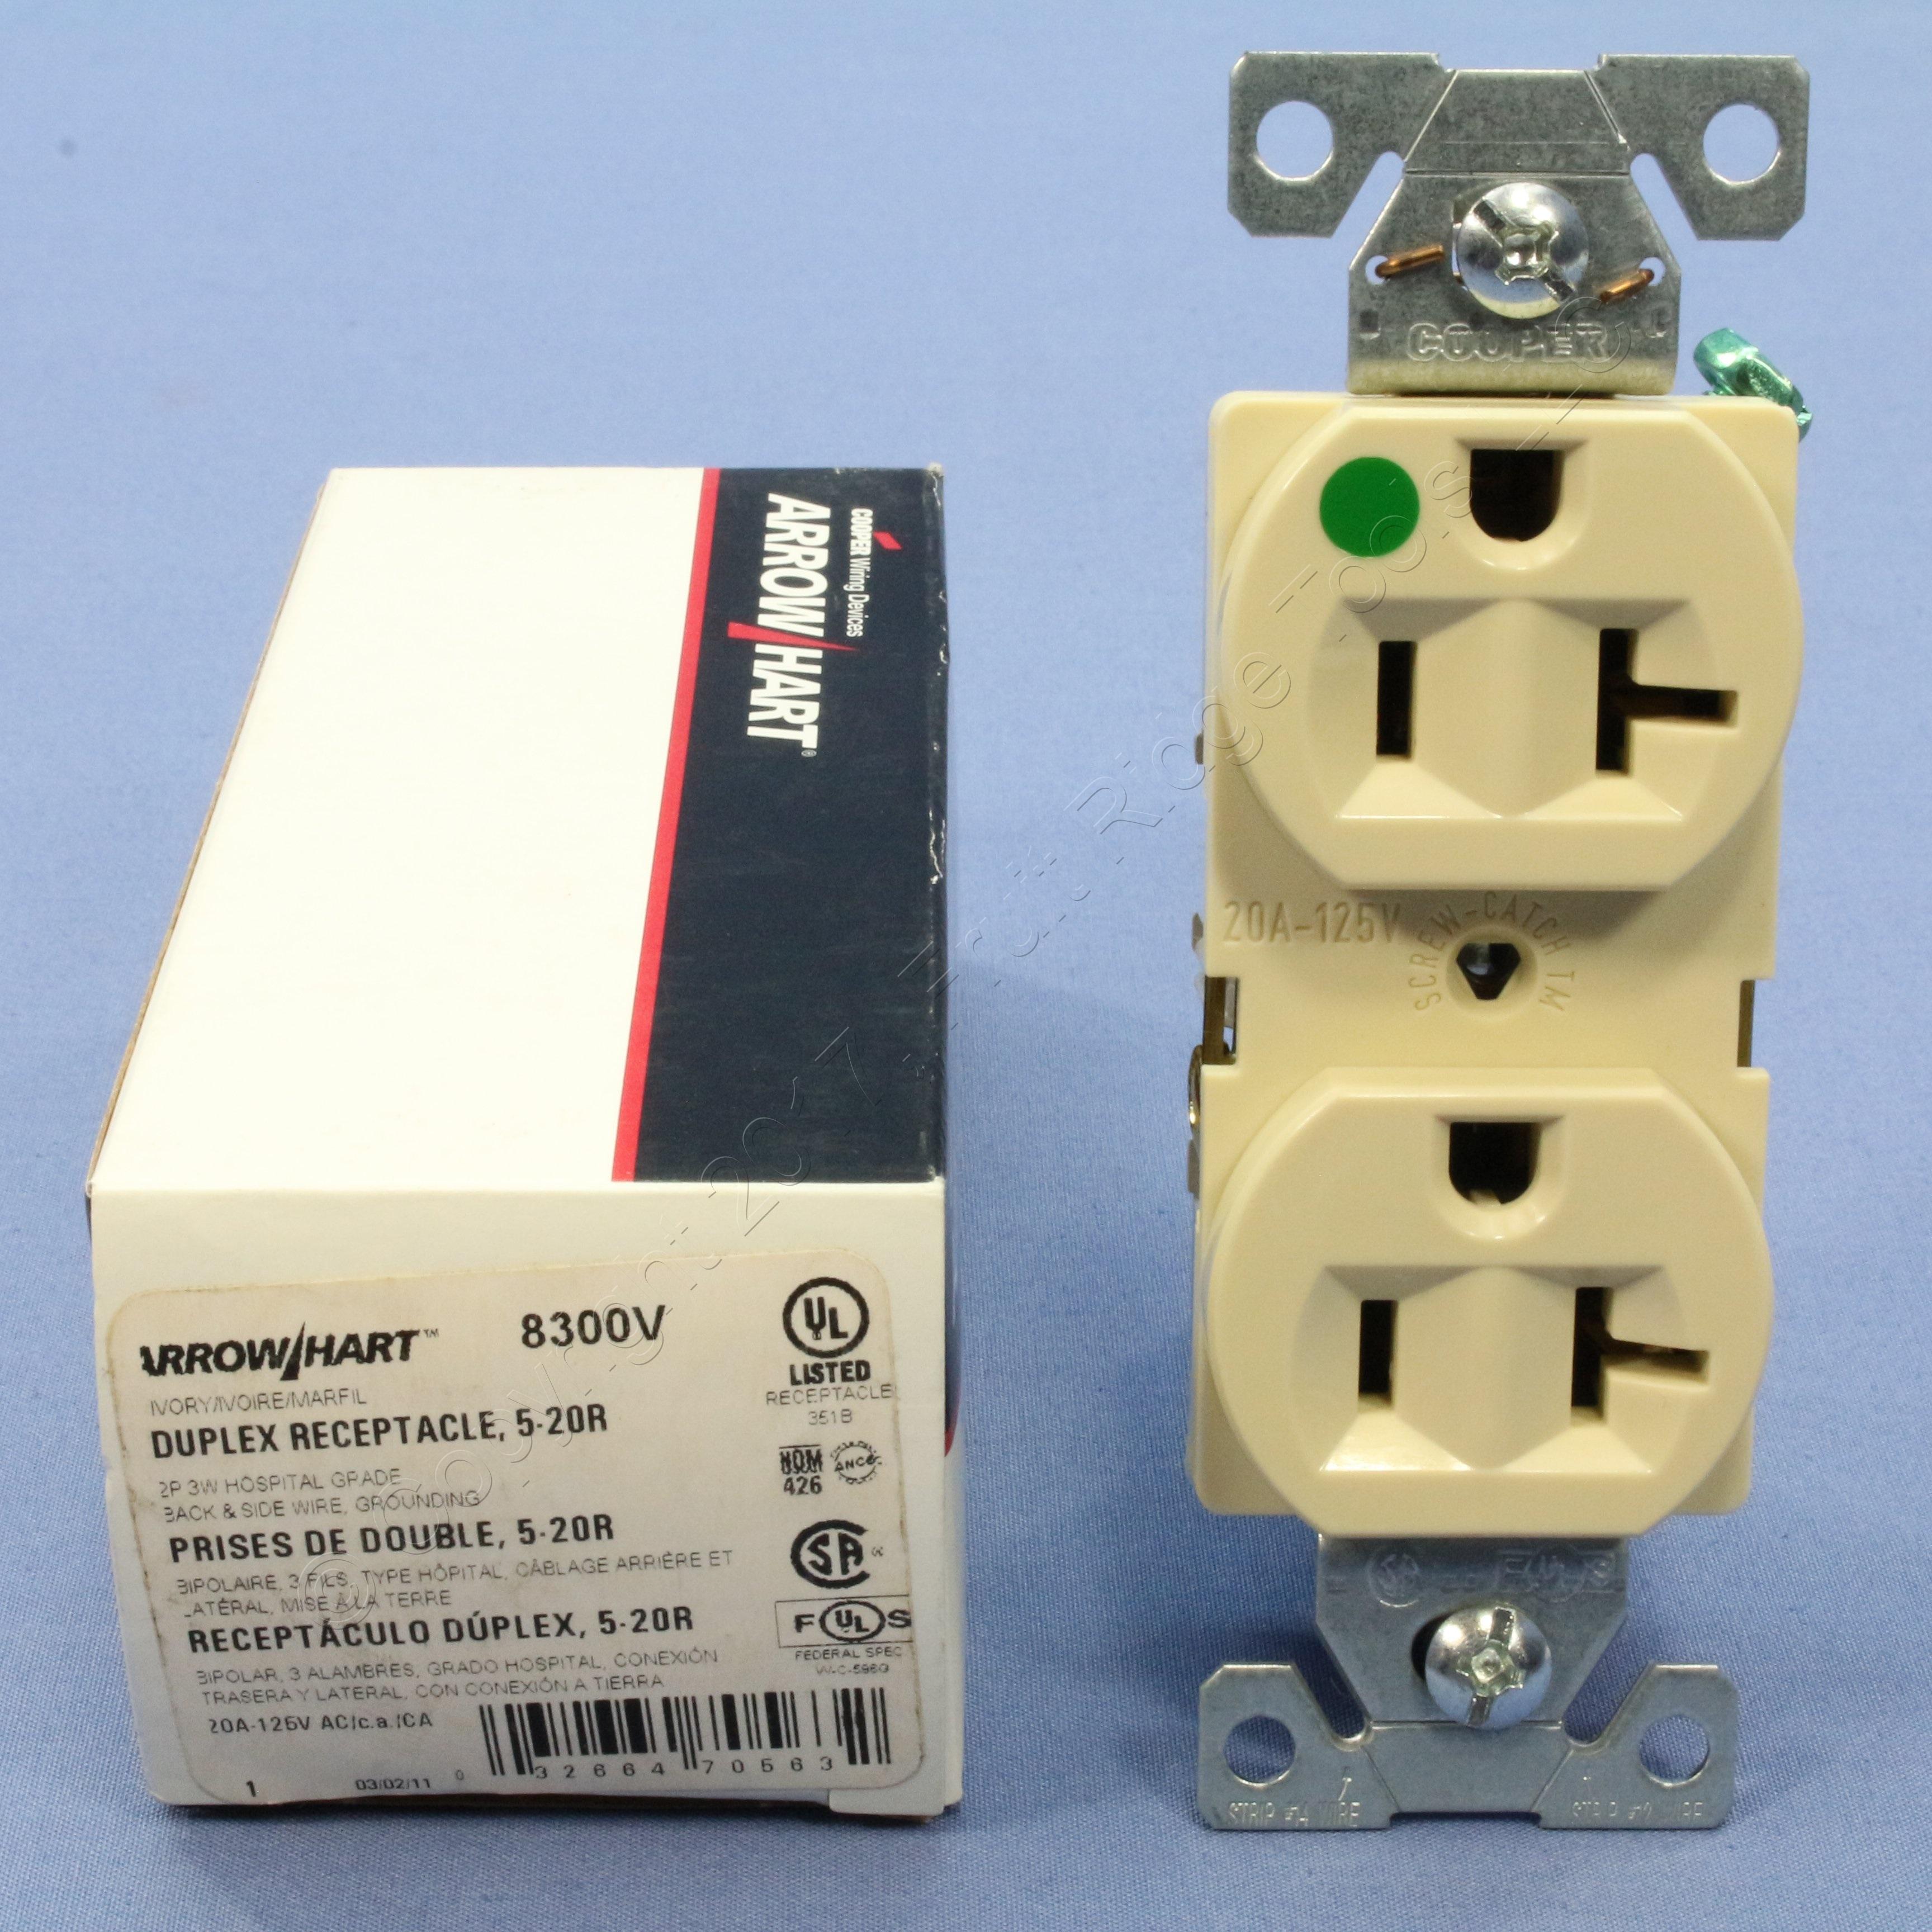 Cooper Ivory Hospital Grade Duplex Receptacle Outlets Nema 5 20r 20a Wiring Electrical Wall 125v 8300v